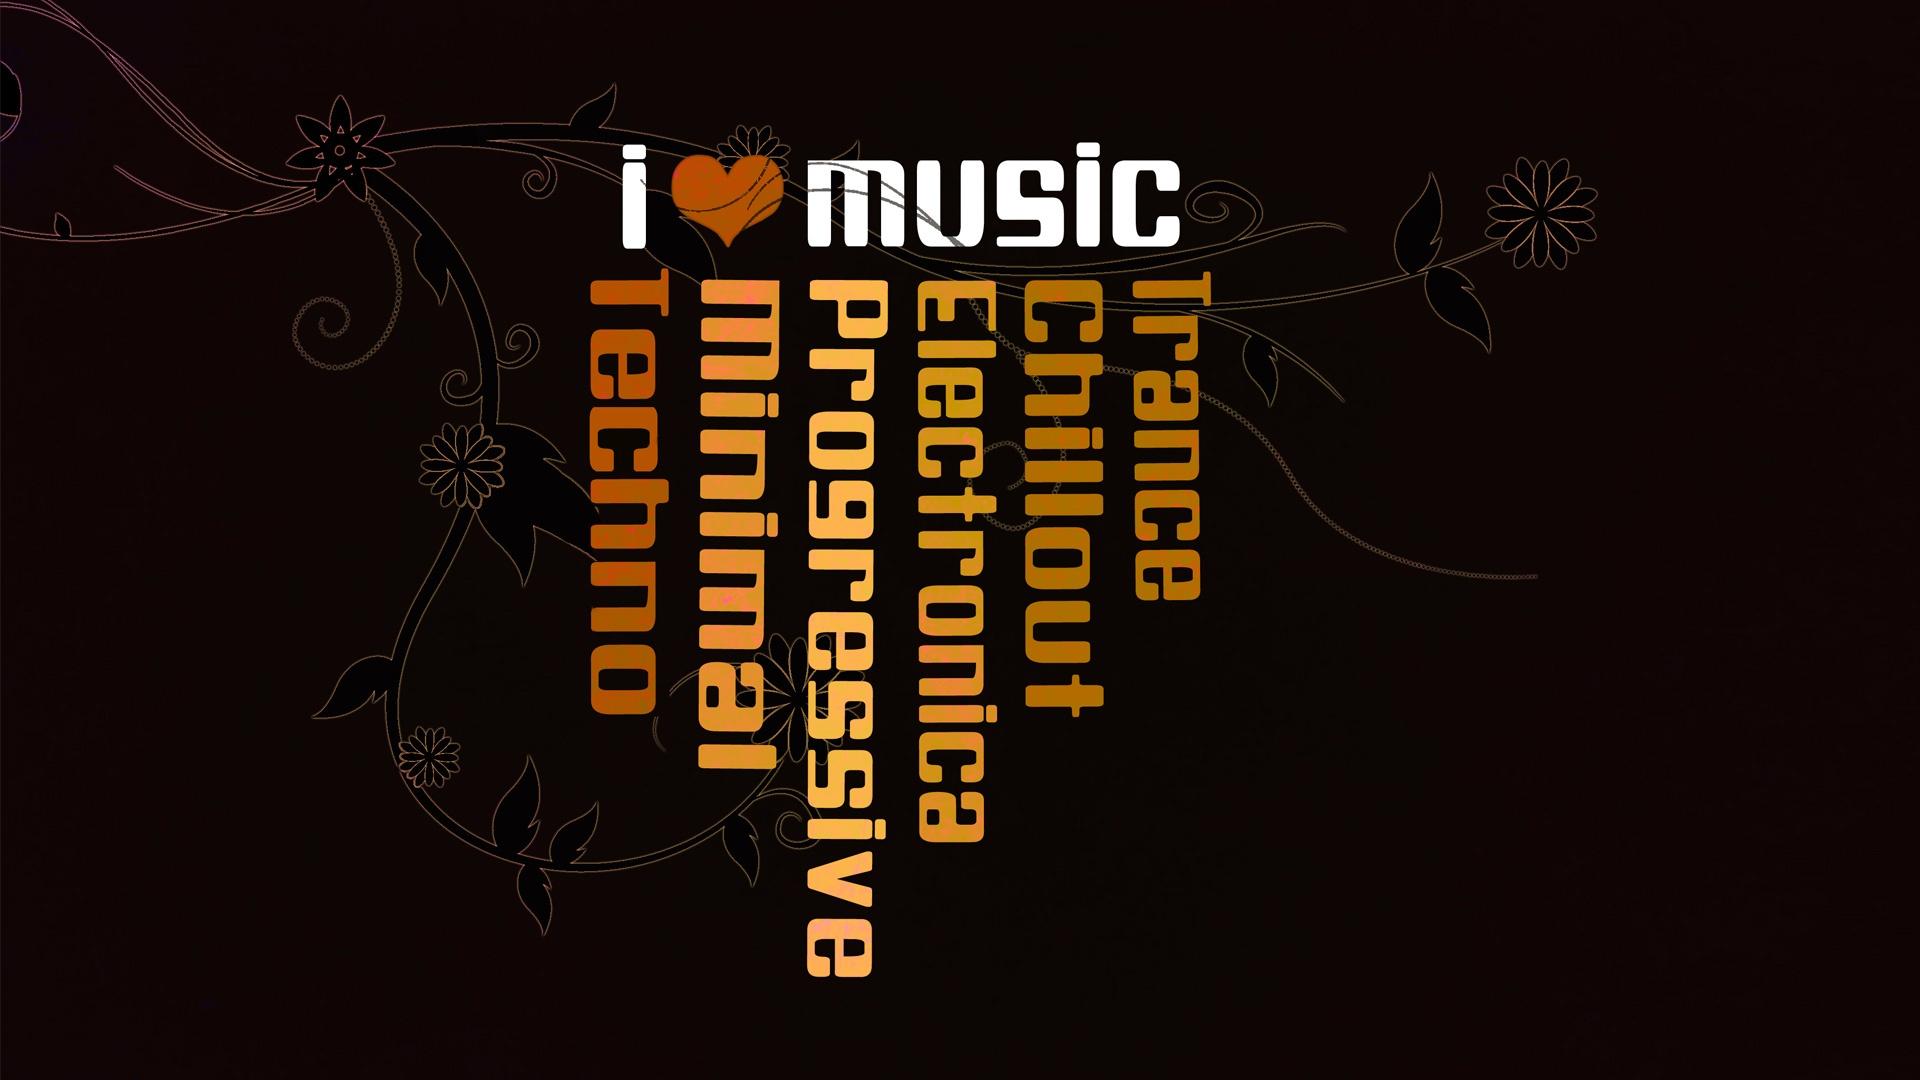 music wallpaper love